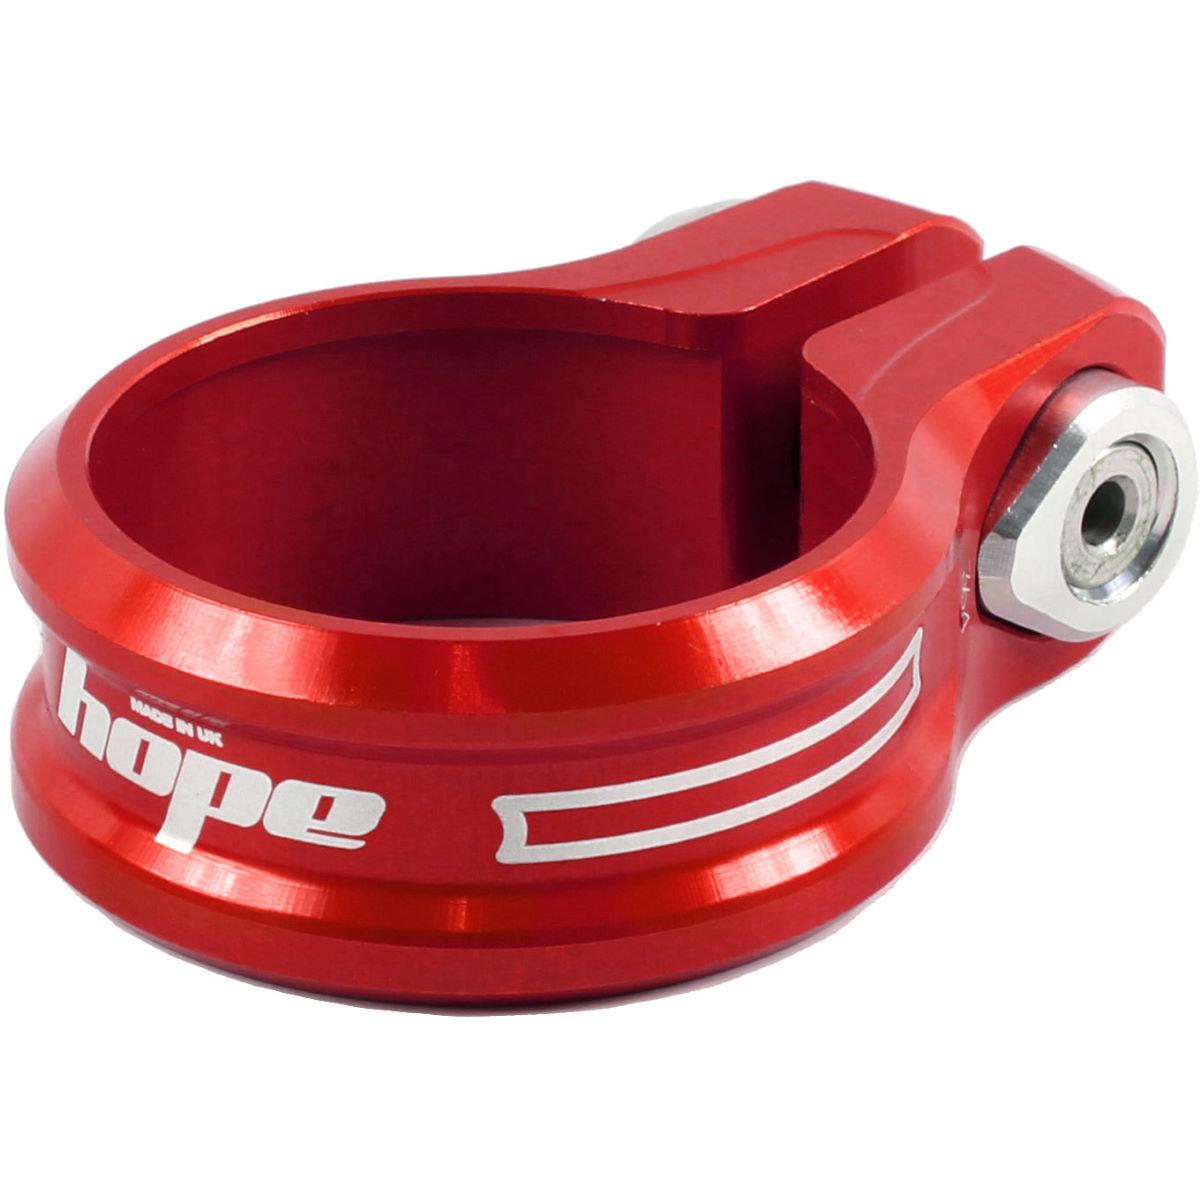 Red KREX 2286-506 Alloy Aluminum Road Bike Cyclying Chain Drop Catcher